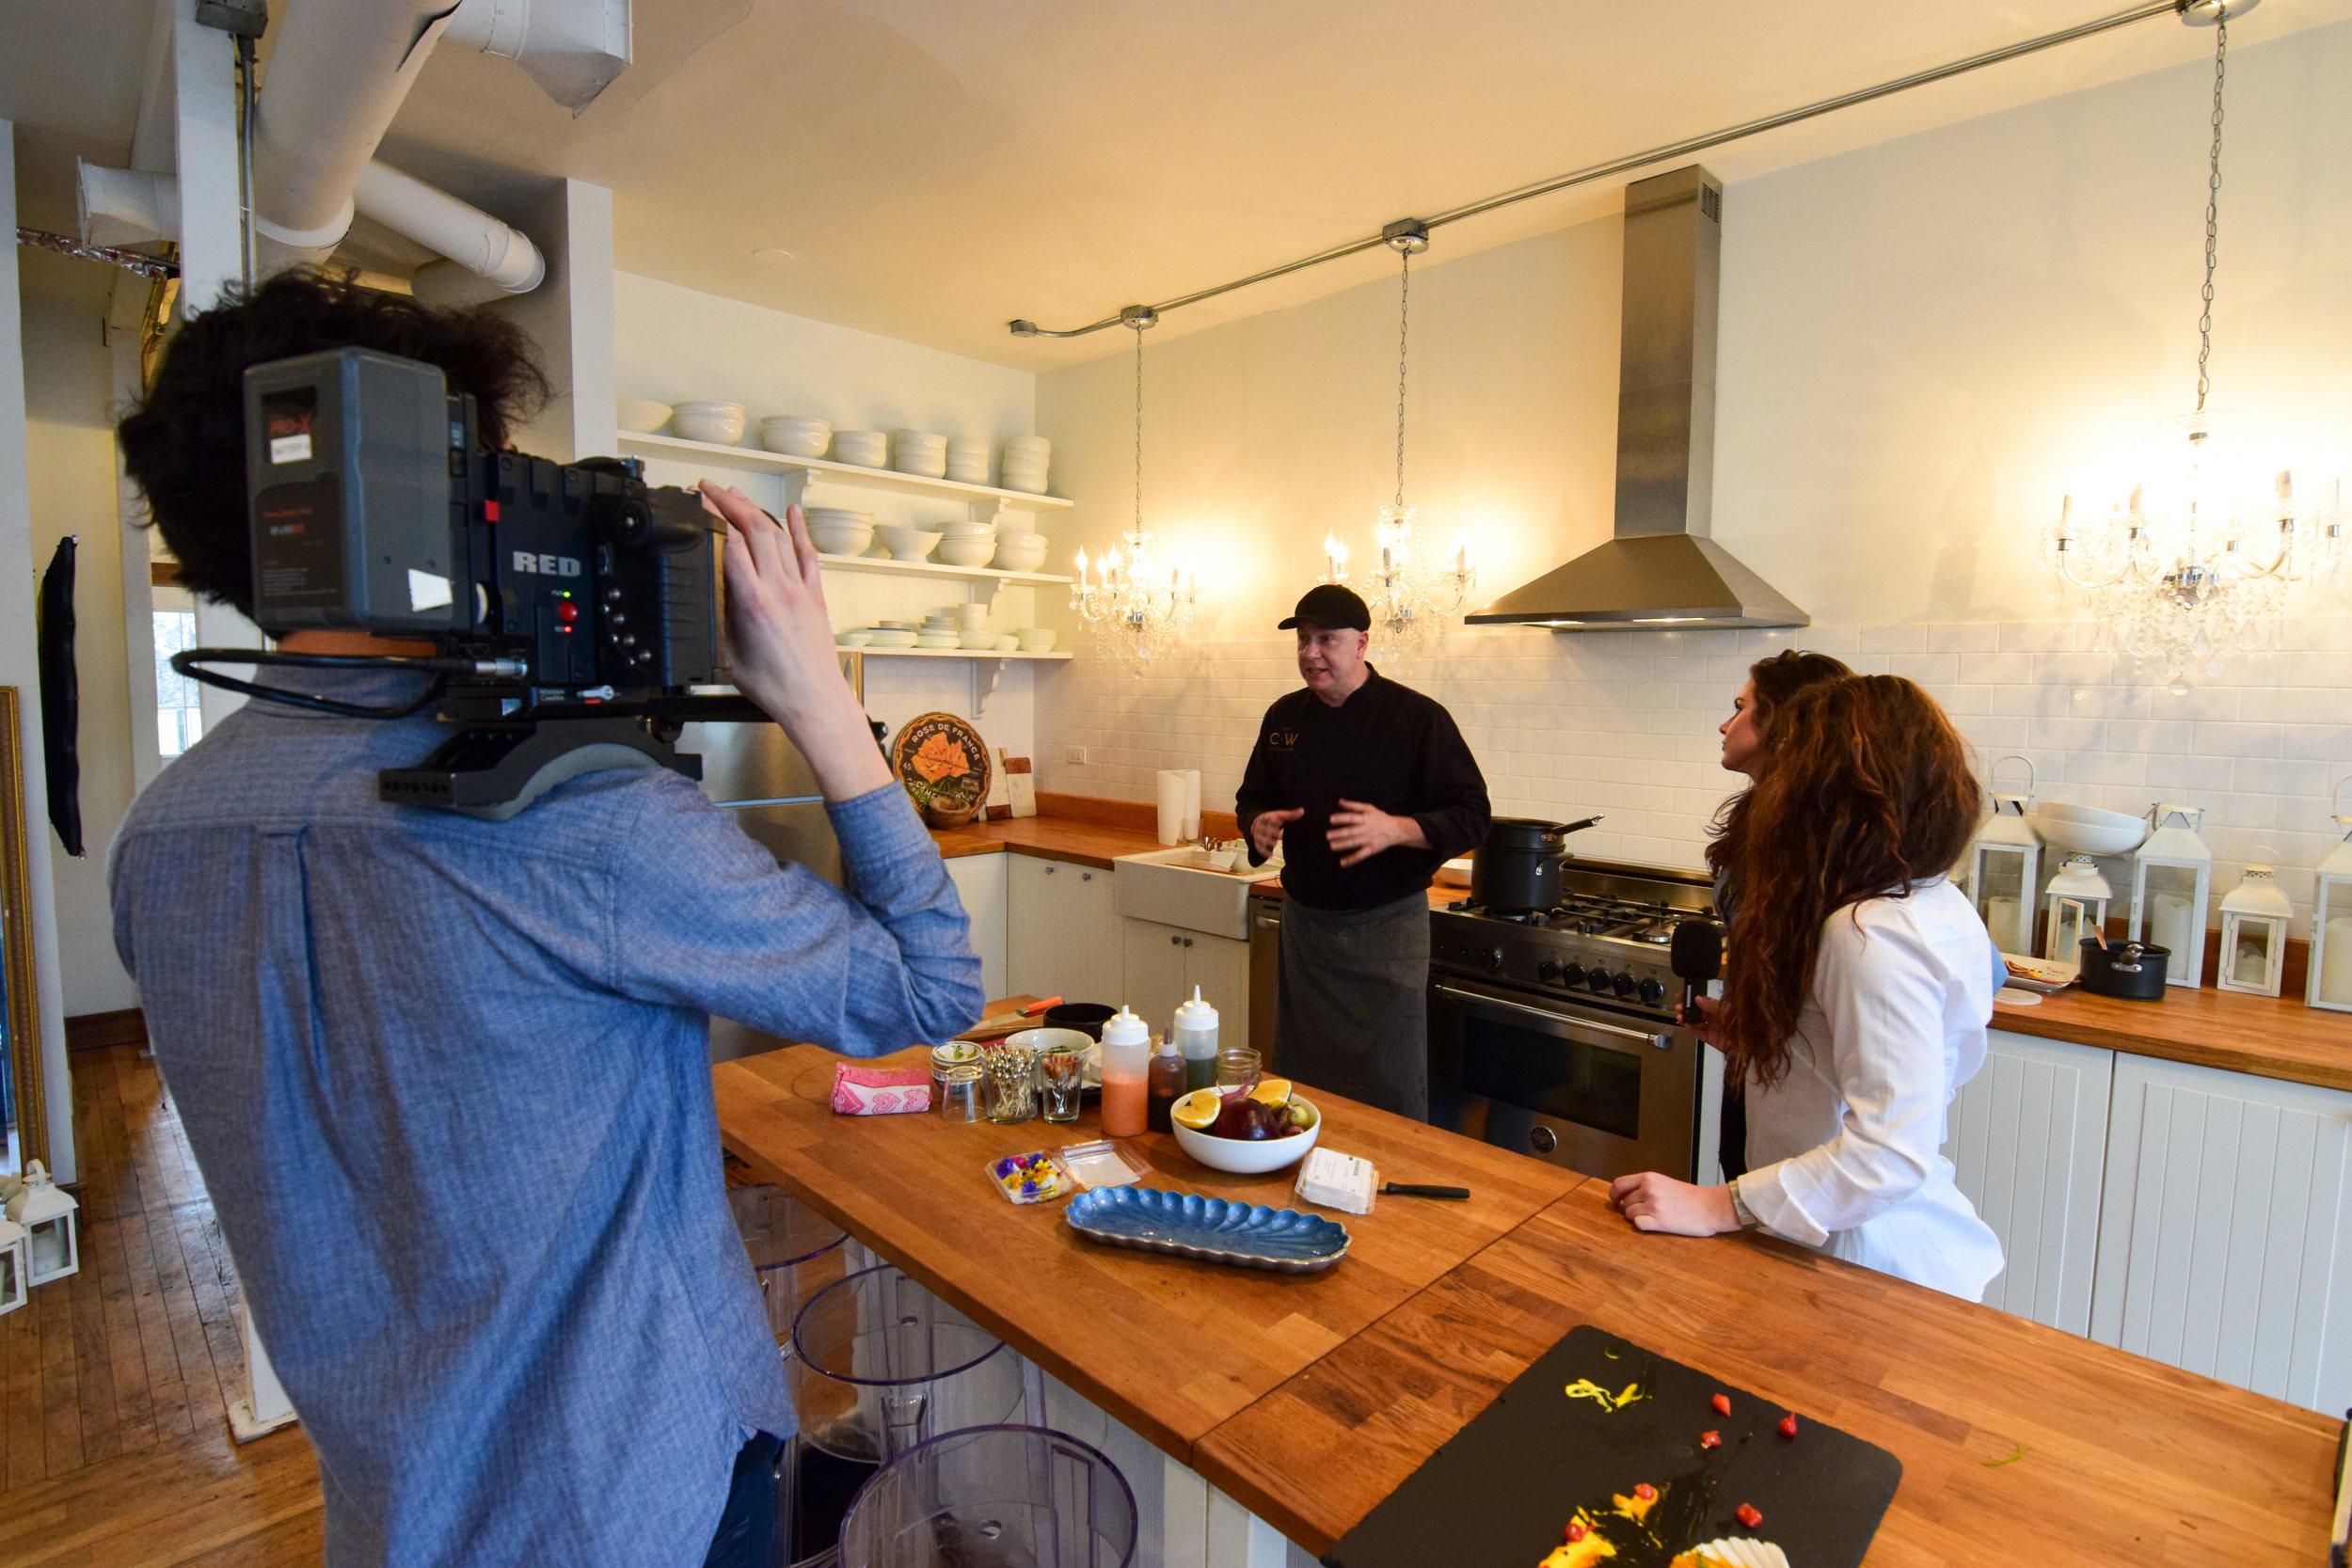 Eric Formato Formatografia photography Maura Gaughan Video Production Entreprenuership Charles Webb Chef Culinary Art -130.jpg